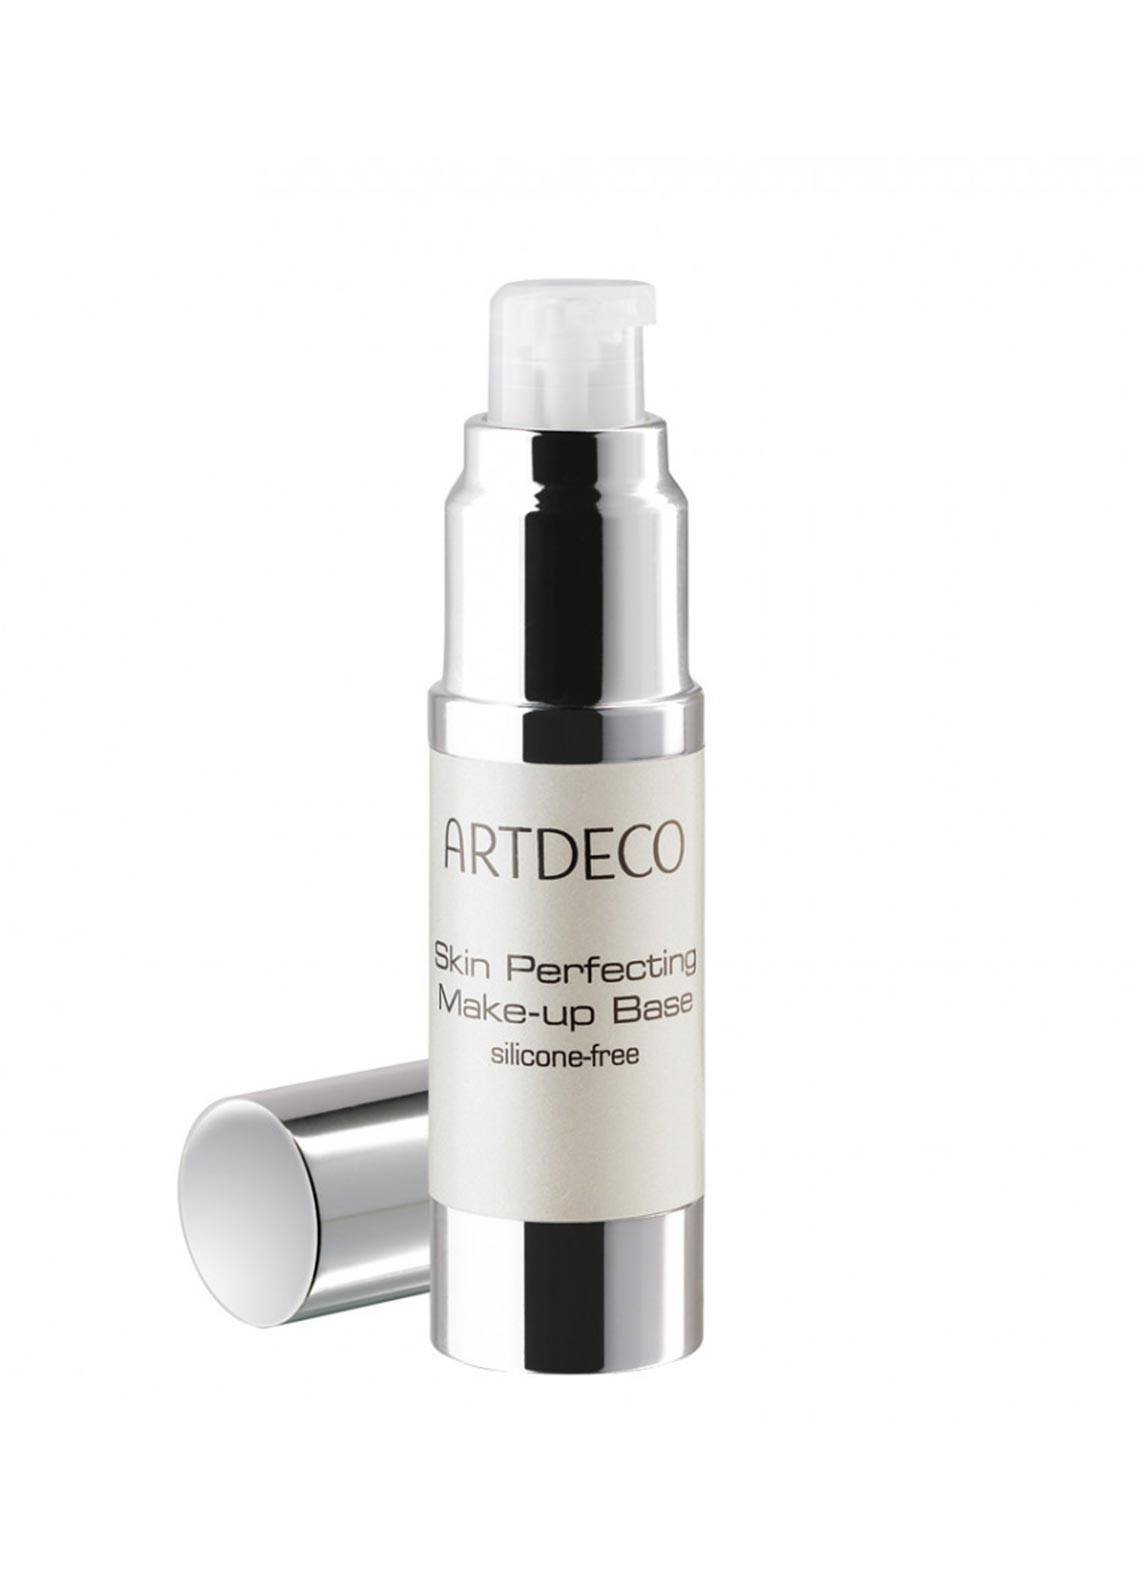 Artdeco Skin Perfection Make-Up Base